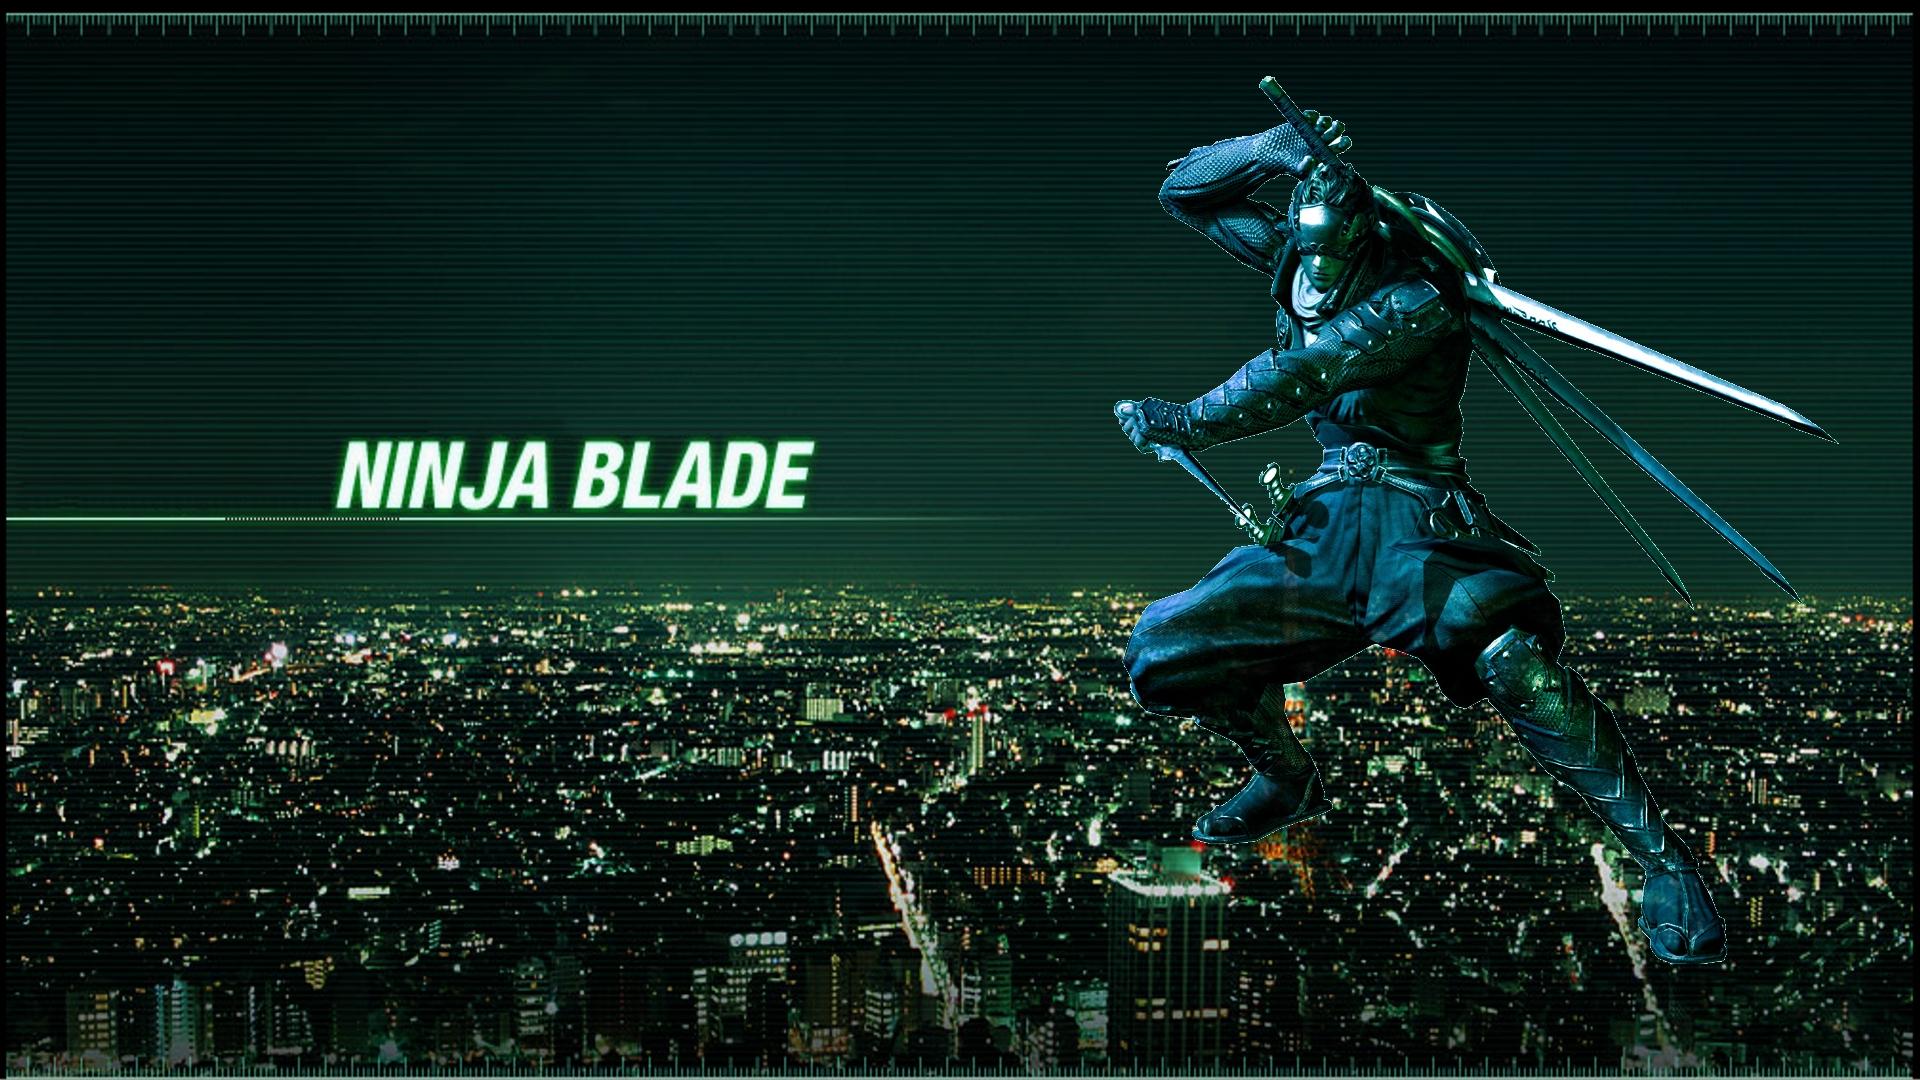 Ninja Blade wallpaper   569416 1920x1080